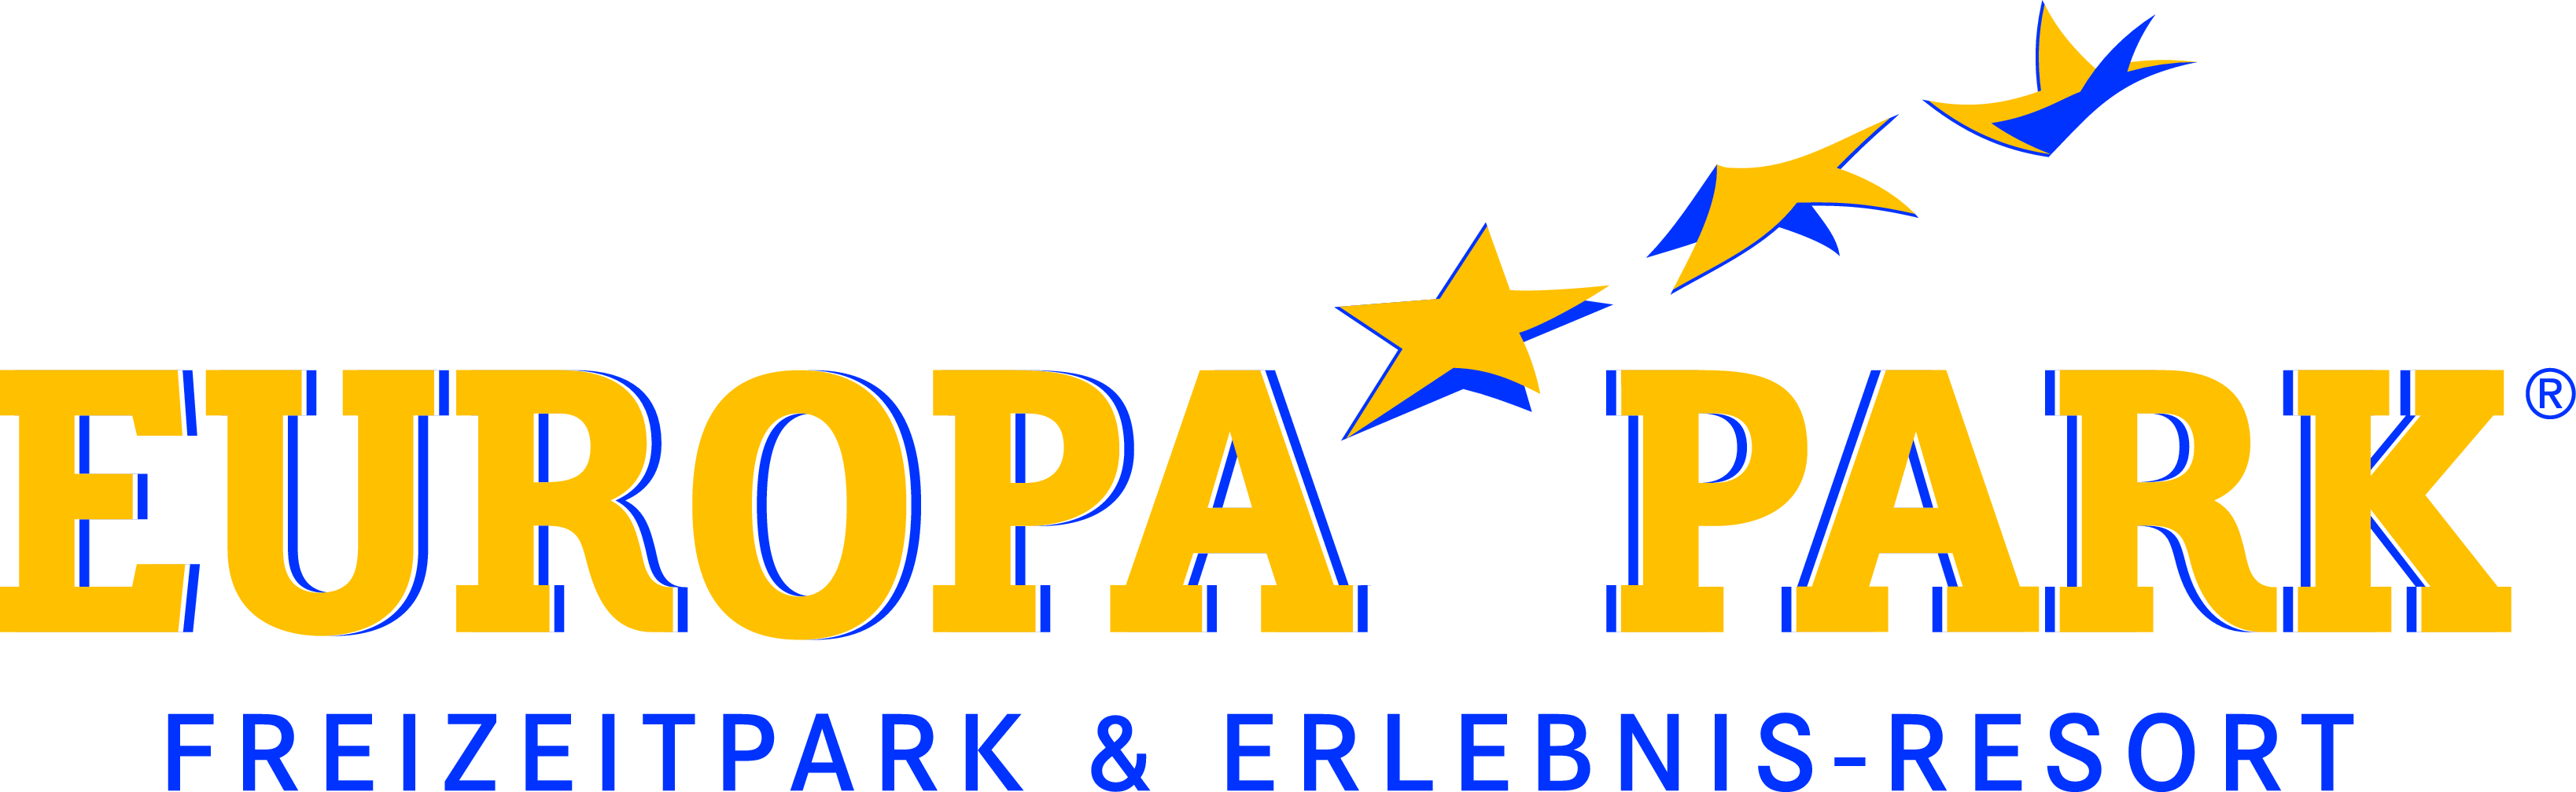 Europapark Bester Tag